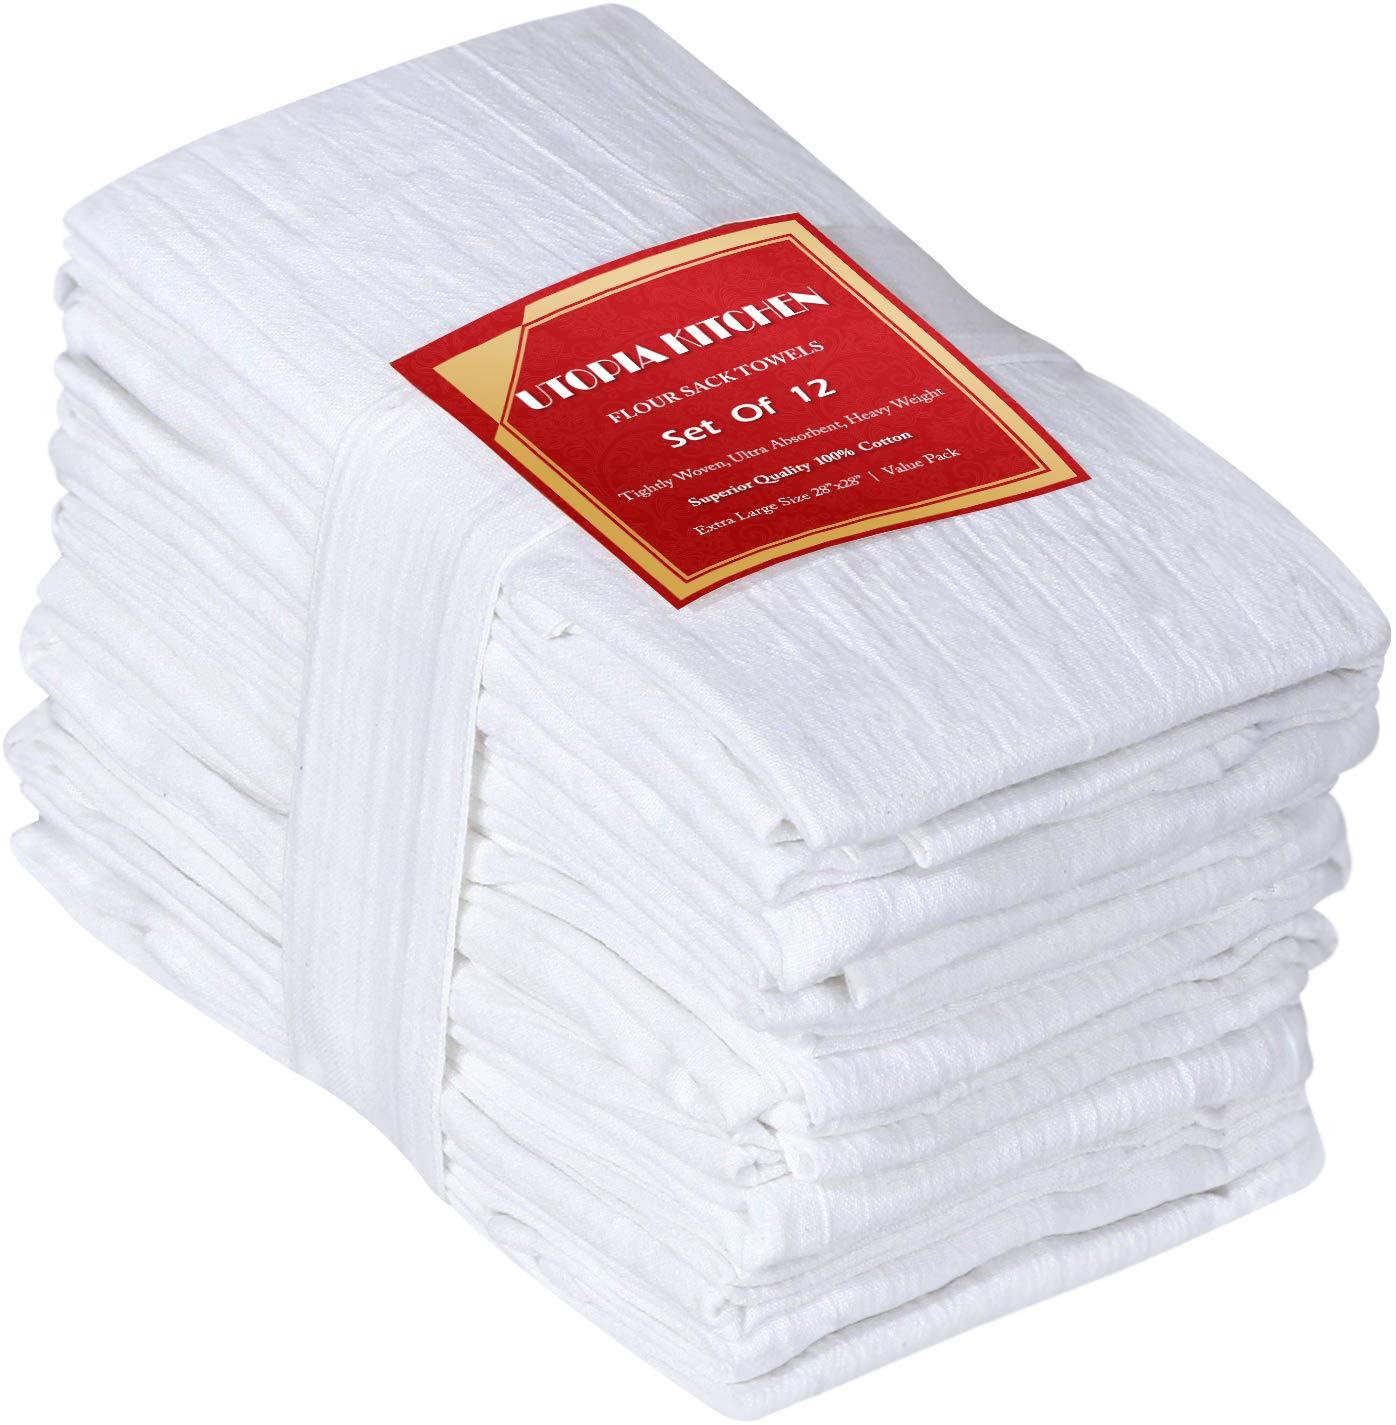 Utopia Kitchen Flour Sack Dish Towels, 12 Pack Cotton Kitchen Towels by Utopia Kitchen